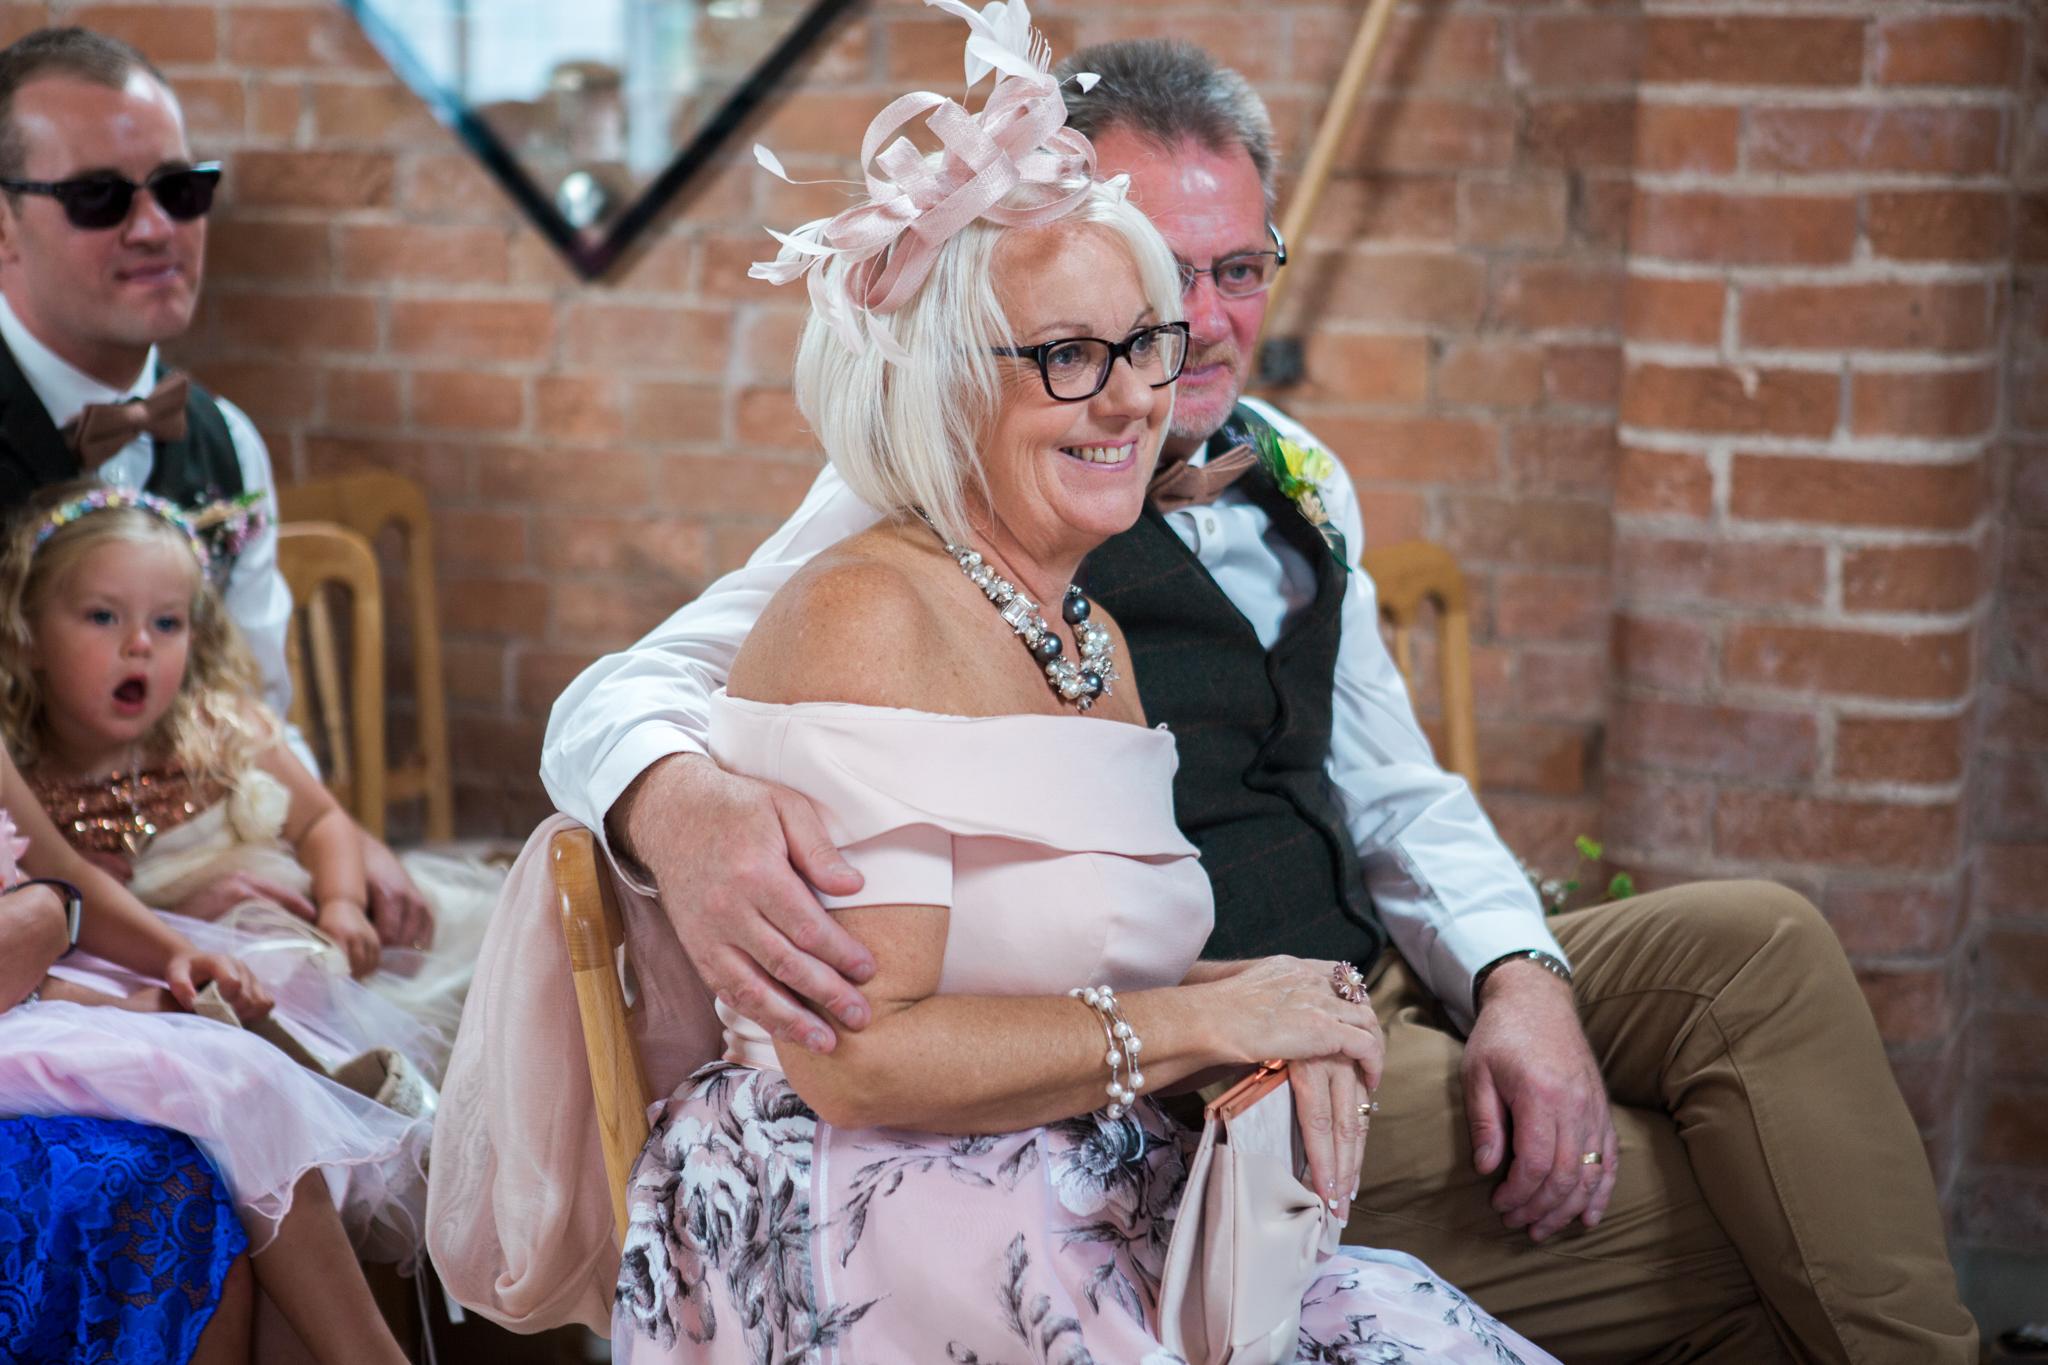 Rowsie & Lee, Swallows Nest Barn Wedding, Cotswold wedding photographer, Warwickshire Wedding Photographer-53.jpg